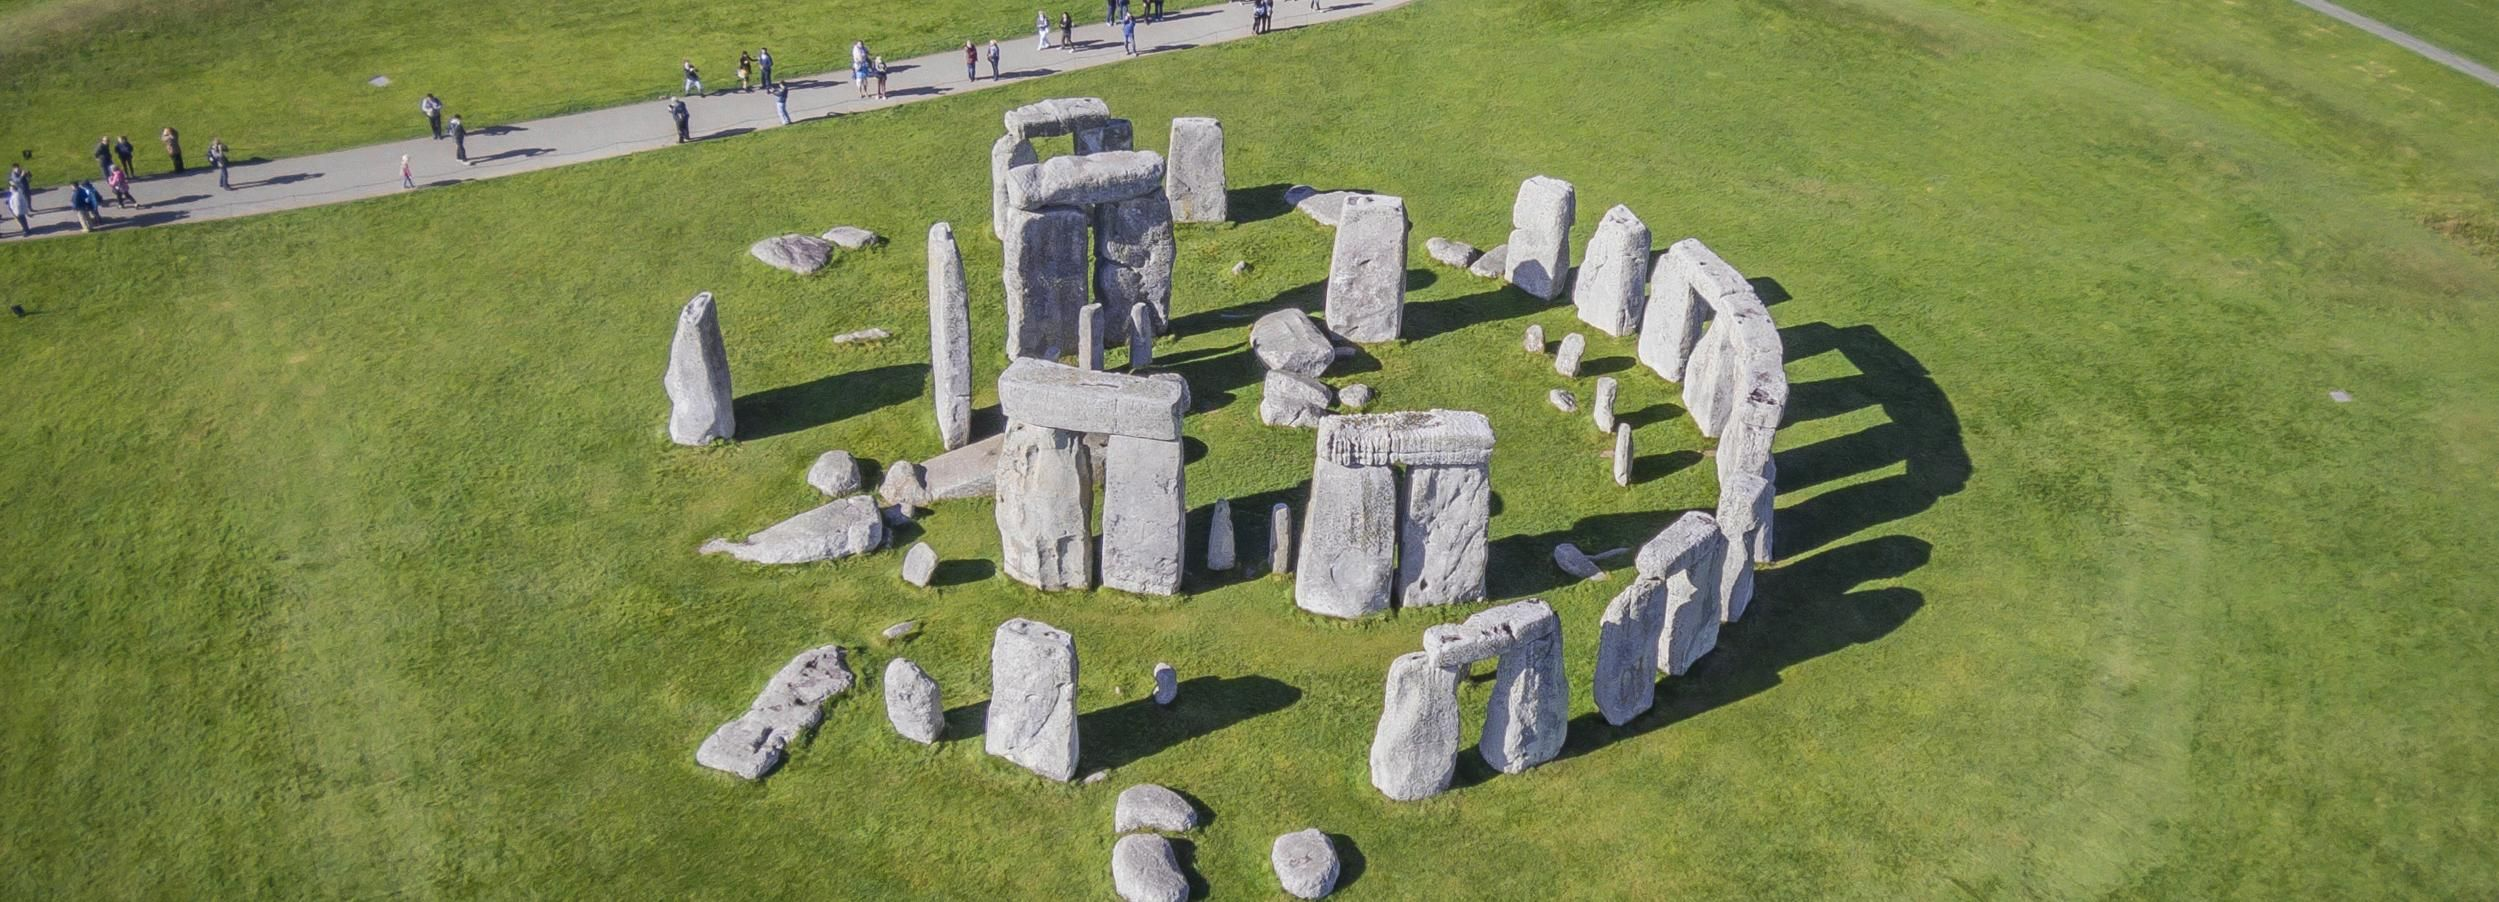 Descubre Windsor, Bath, Stonehenge y Salisbury